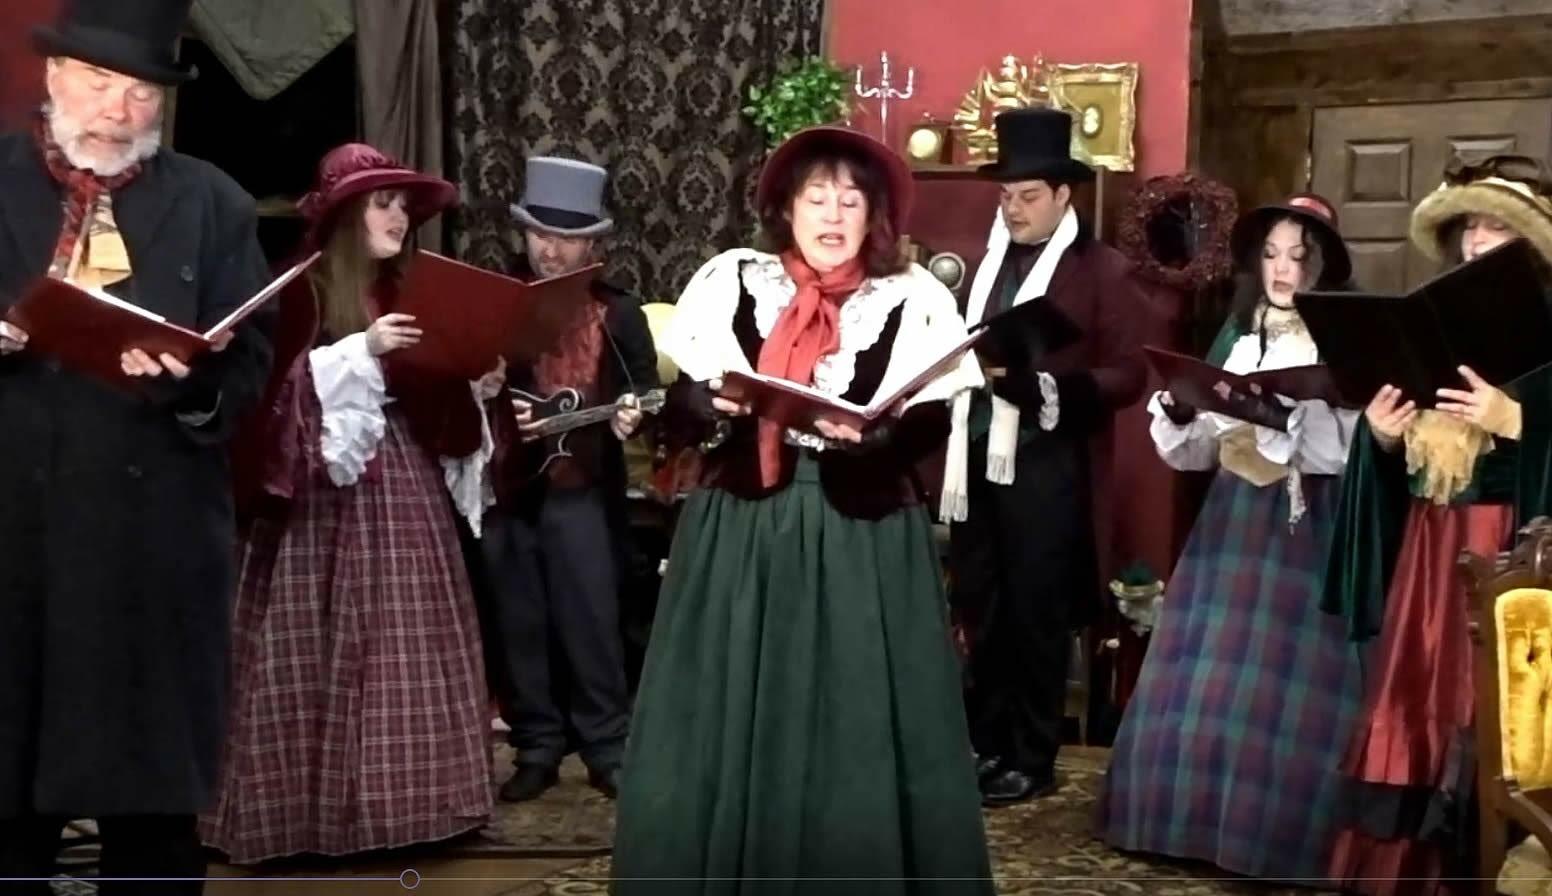 The Dickens Carolers performing at Southampton Cultural Center's virtual holiday event. From left, Ken Dorph, Rachel DeMasi, Paul DeMasi, Bonnie Grice, Ryan Hayes, Adriana Satornino, Jessie Haynes.